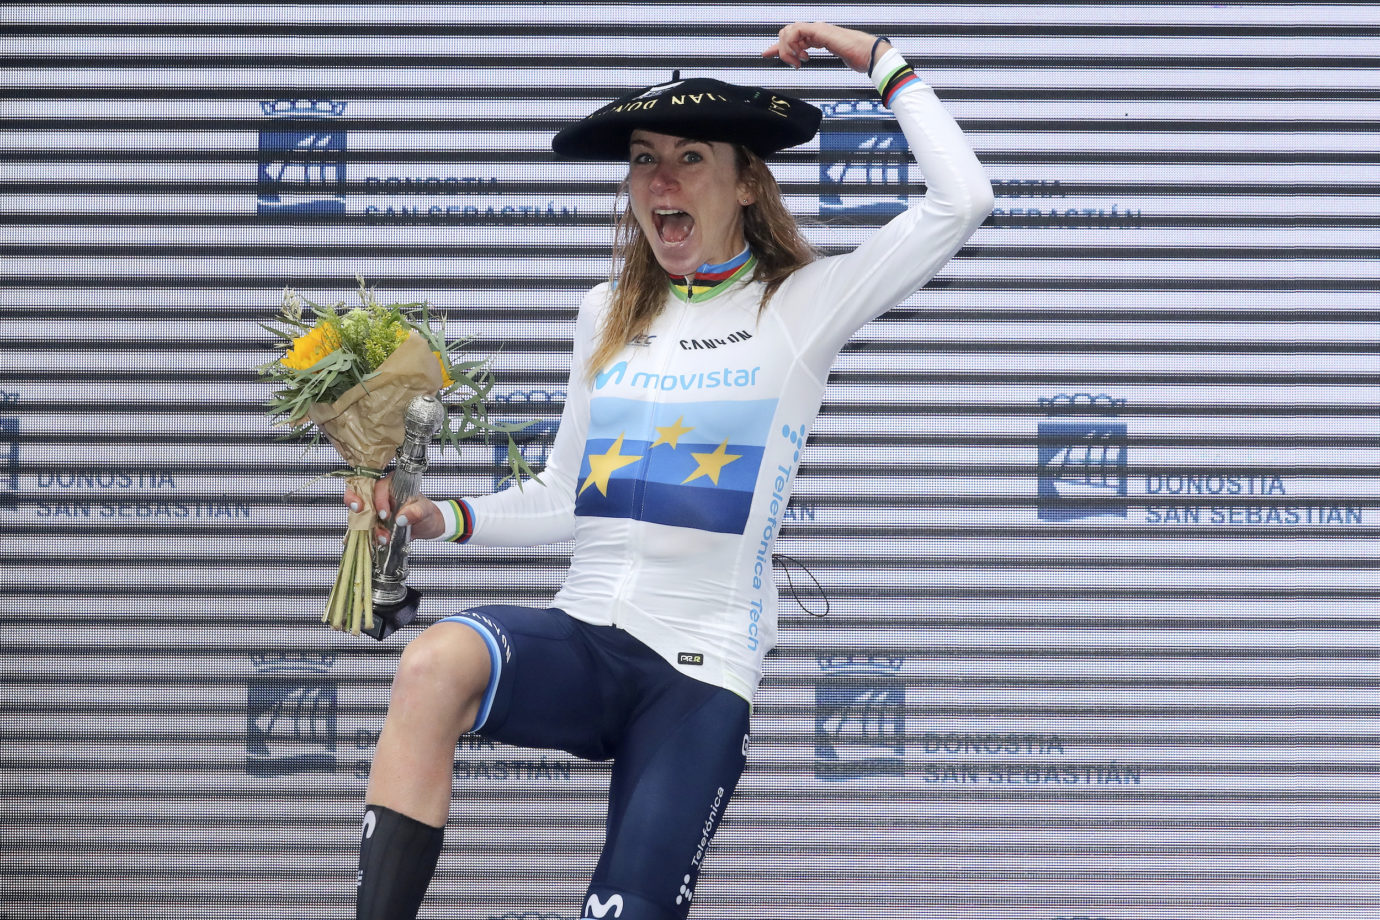 Imagen de la noticia 'Van Vleuten, Movistar Team triumph at Clásica San Sebastián'